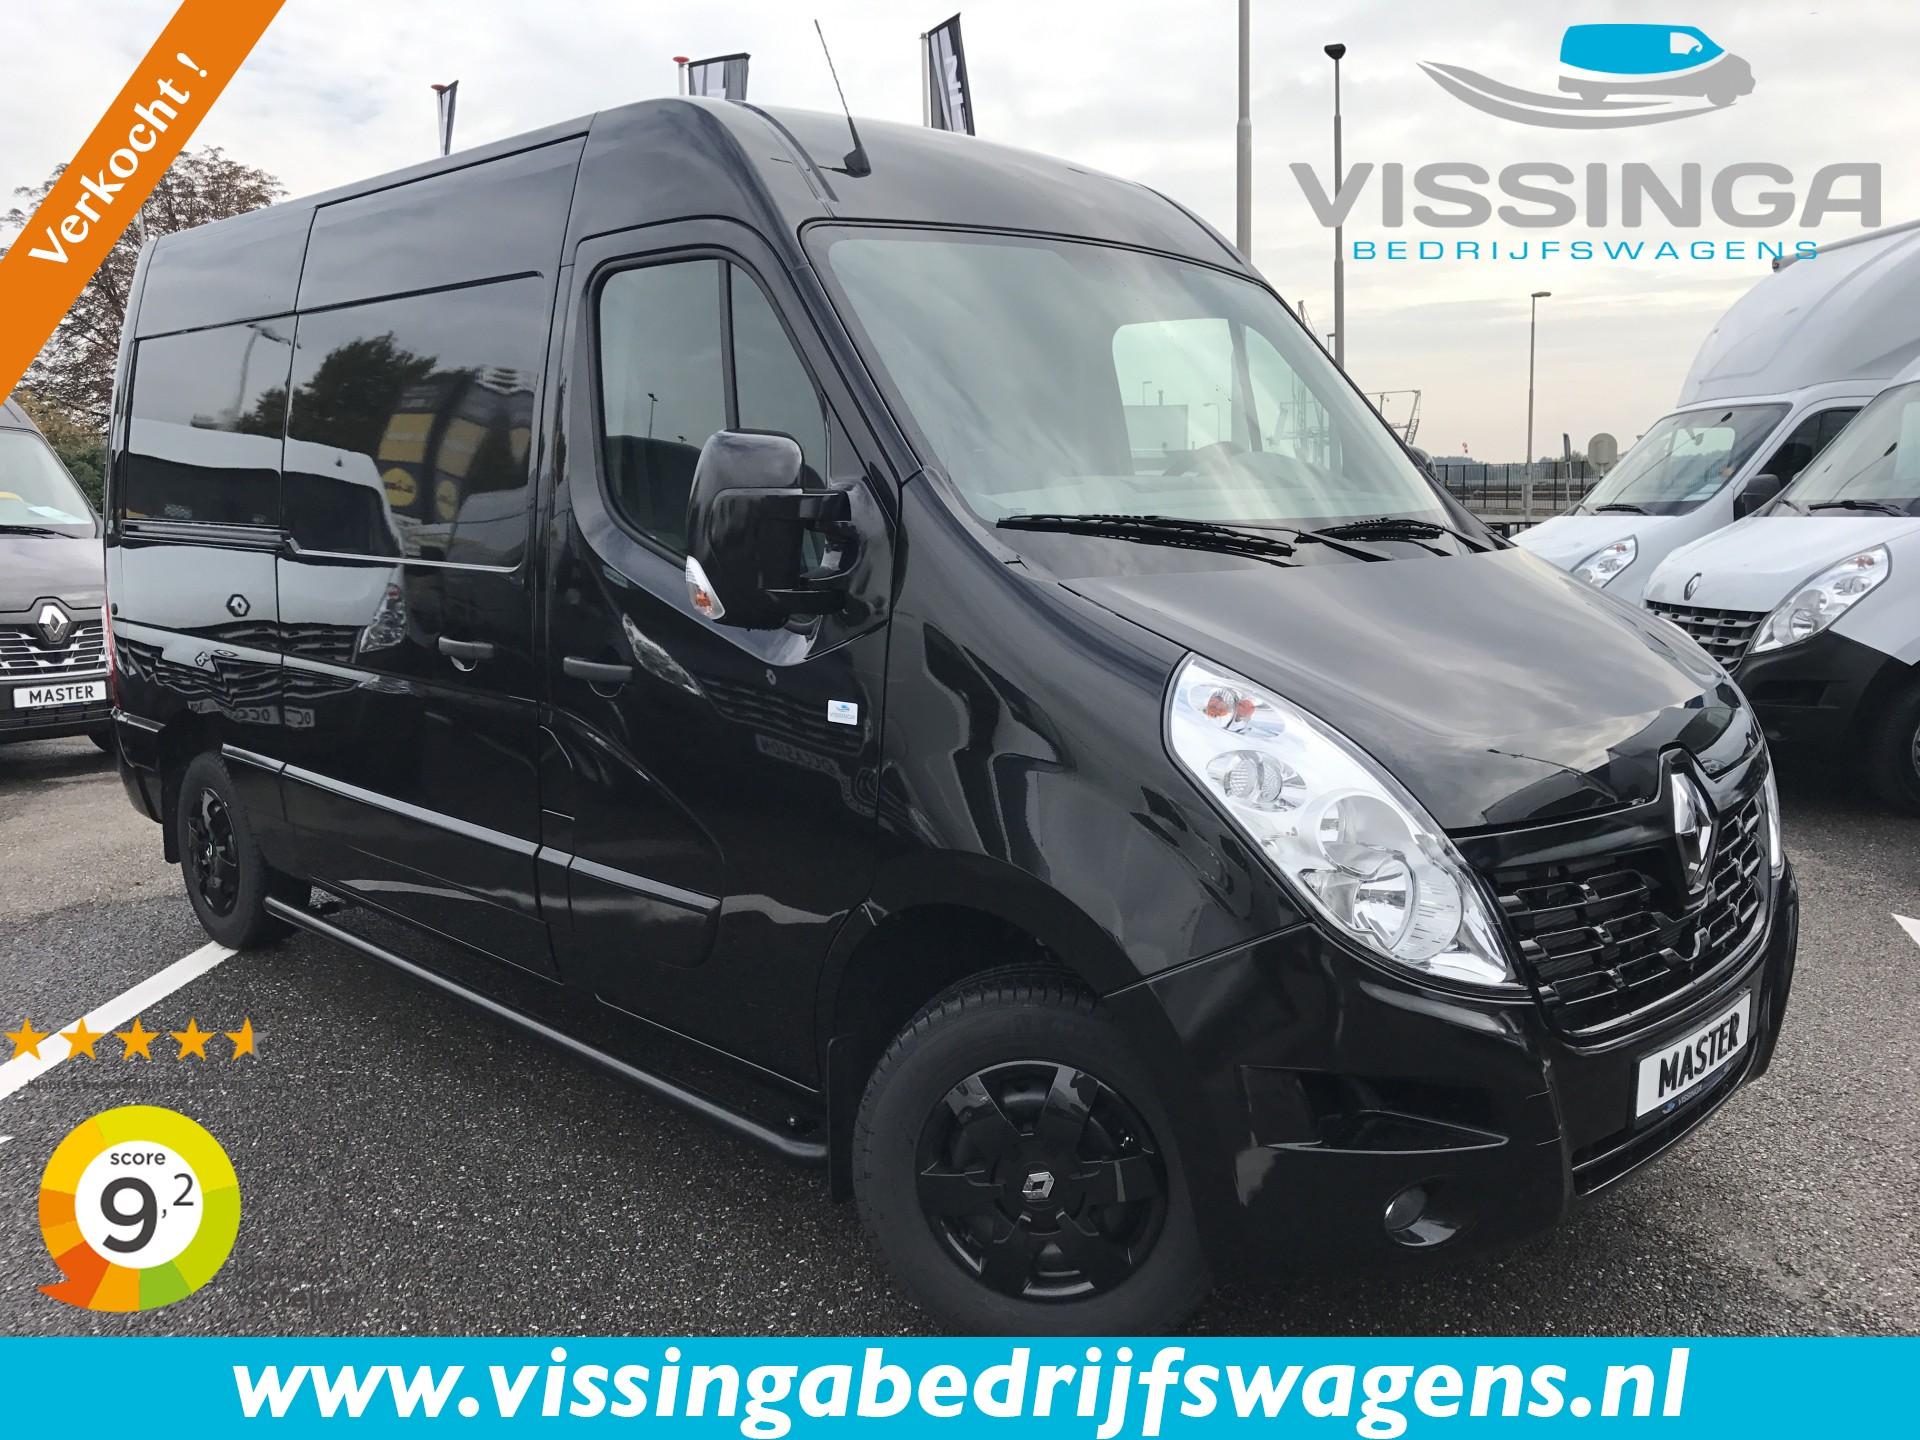 Renault Master T35 2.3 dCi L2H2 145 pk Vissinga Black Edition